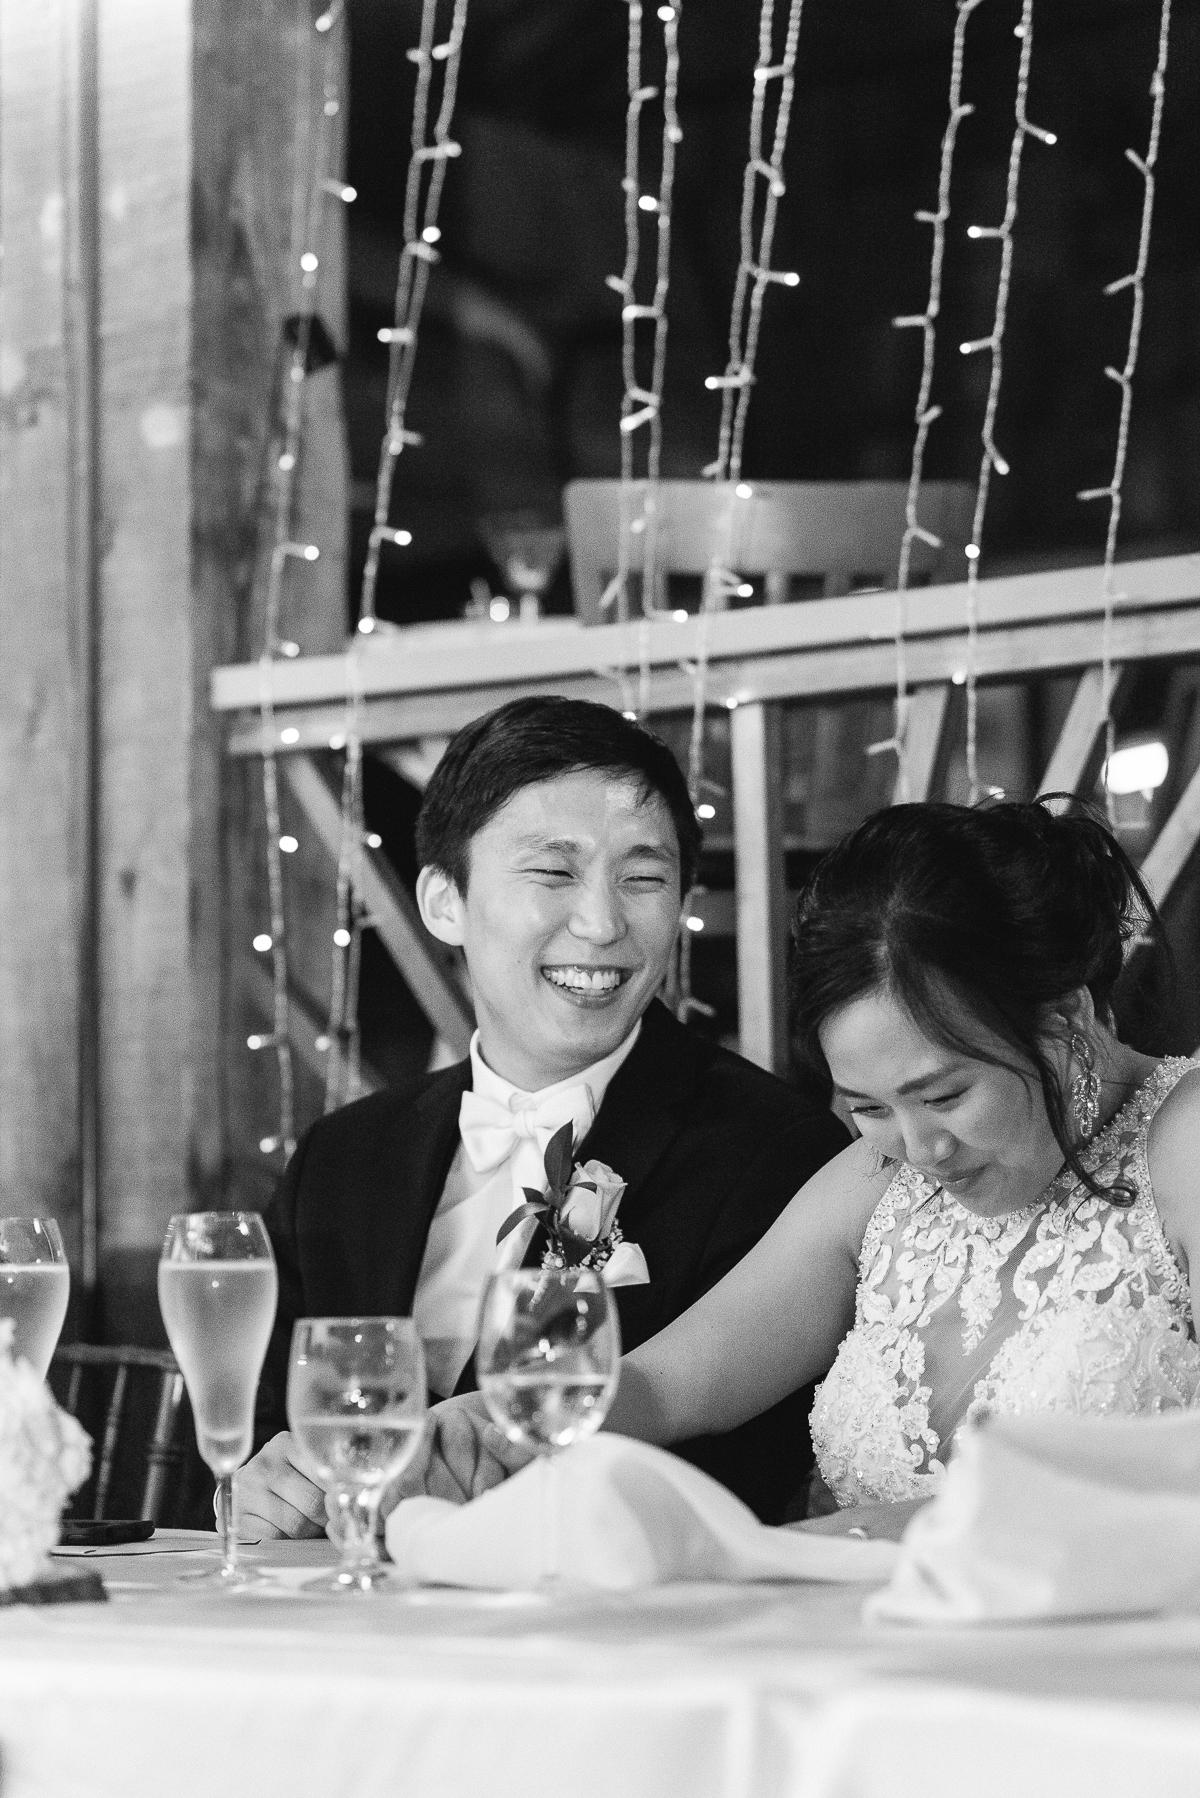 VA-Wedding-Occuqan-Madigan-Waterfront-Bride-Groom-13.jpg